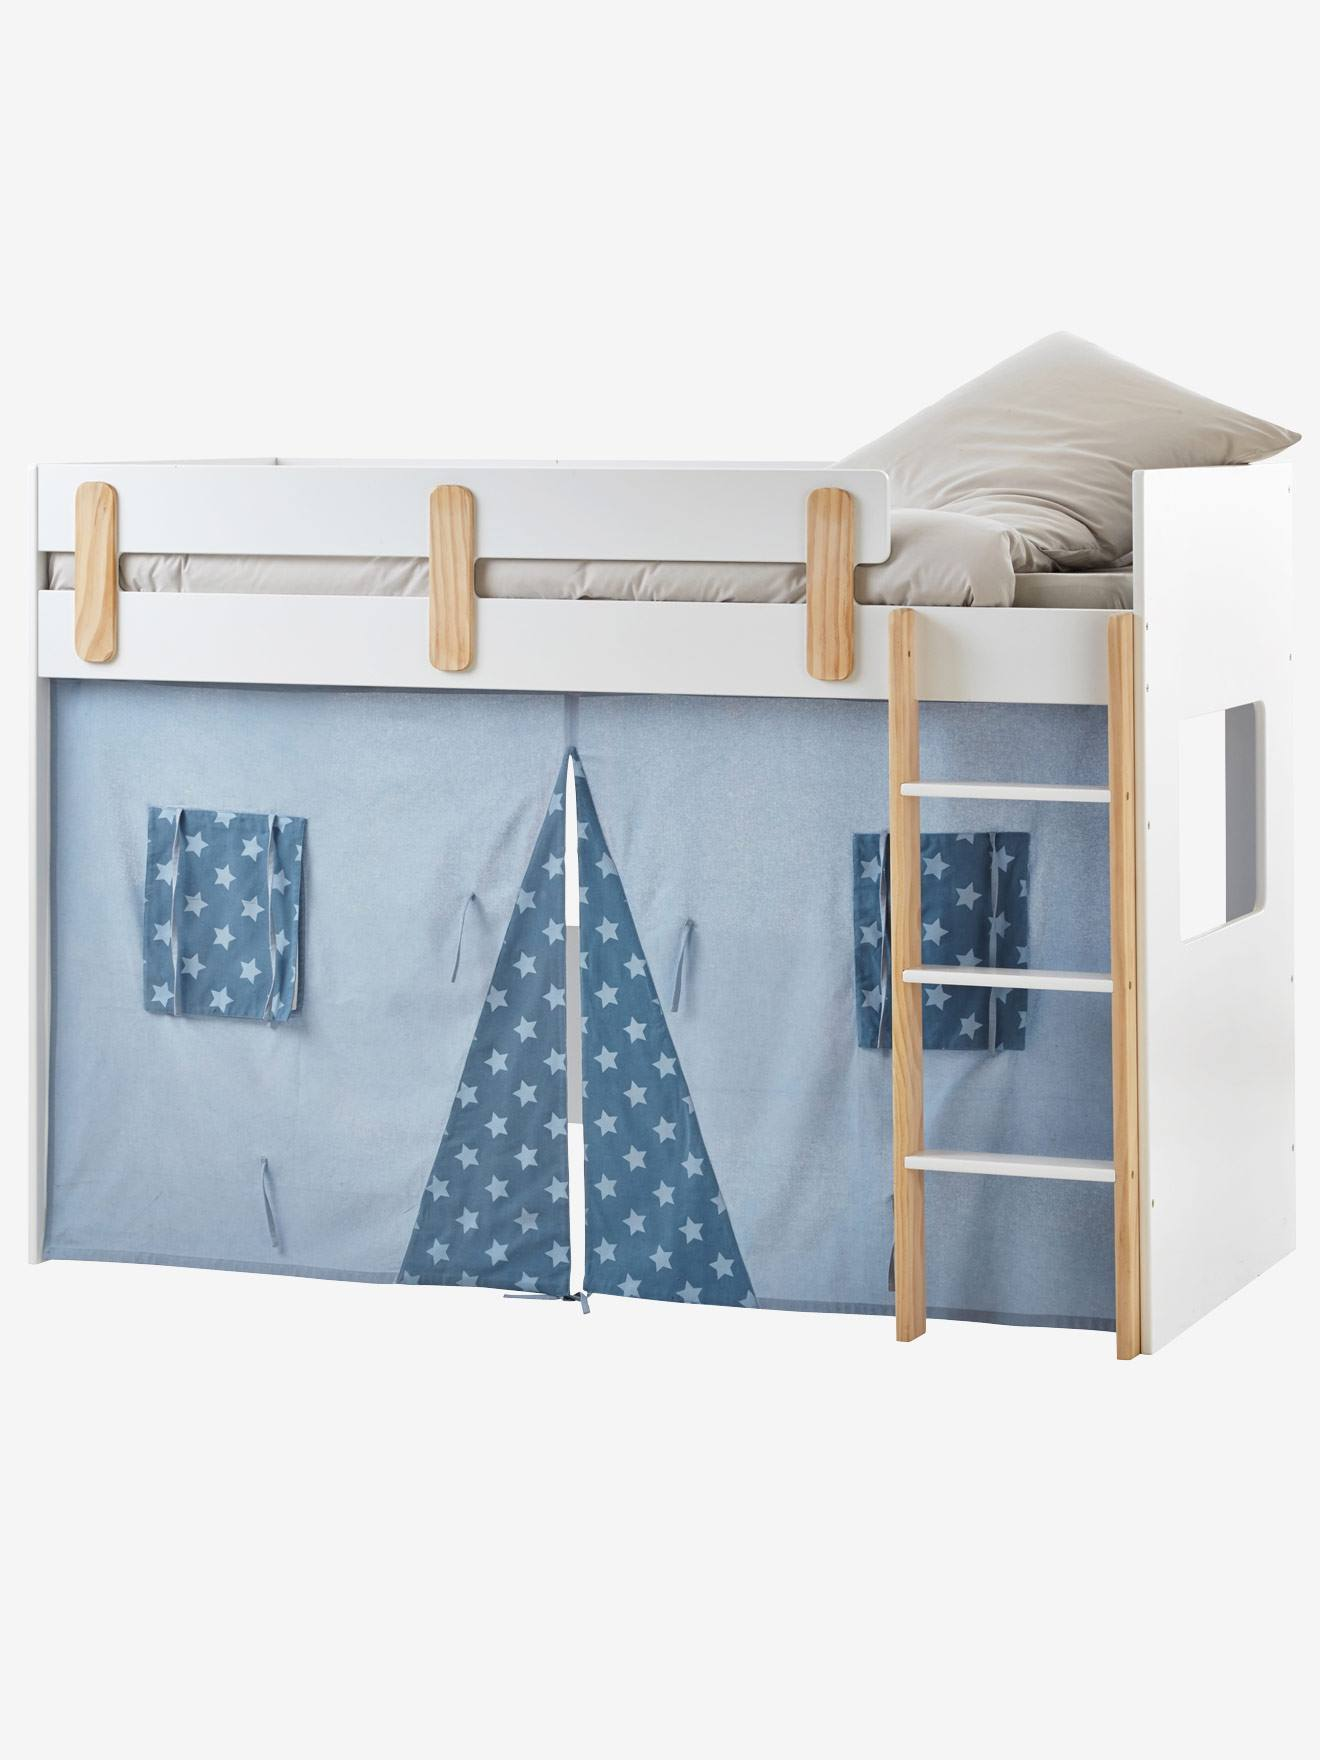 rideau vert baudet fabulous dco rideau anti mouche leroy merlin roubaix bain phenomenal rideau. Black Bedroom Furniture Sets. Home Design Ideas